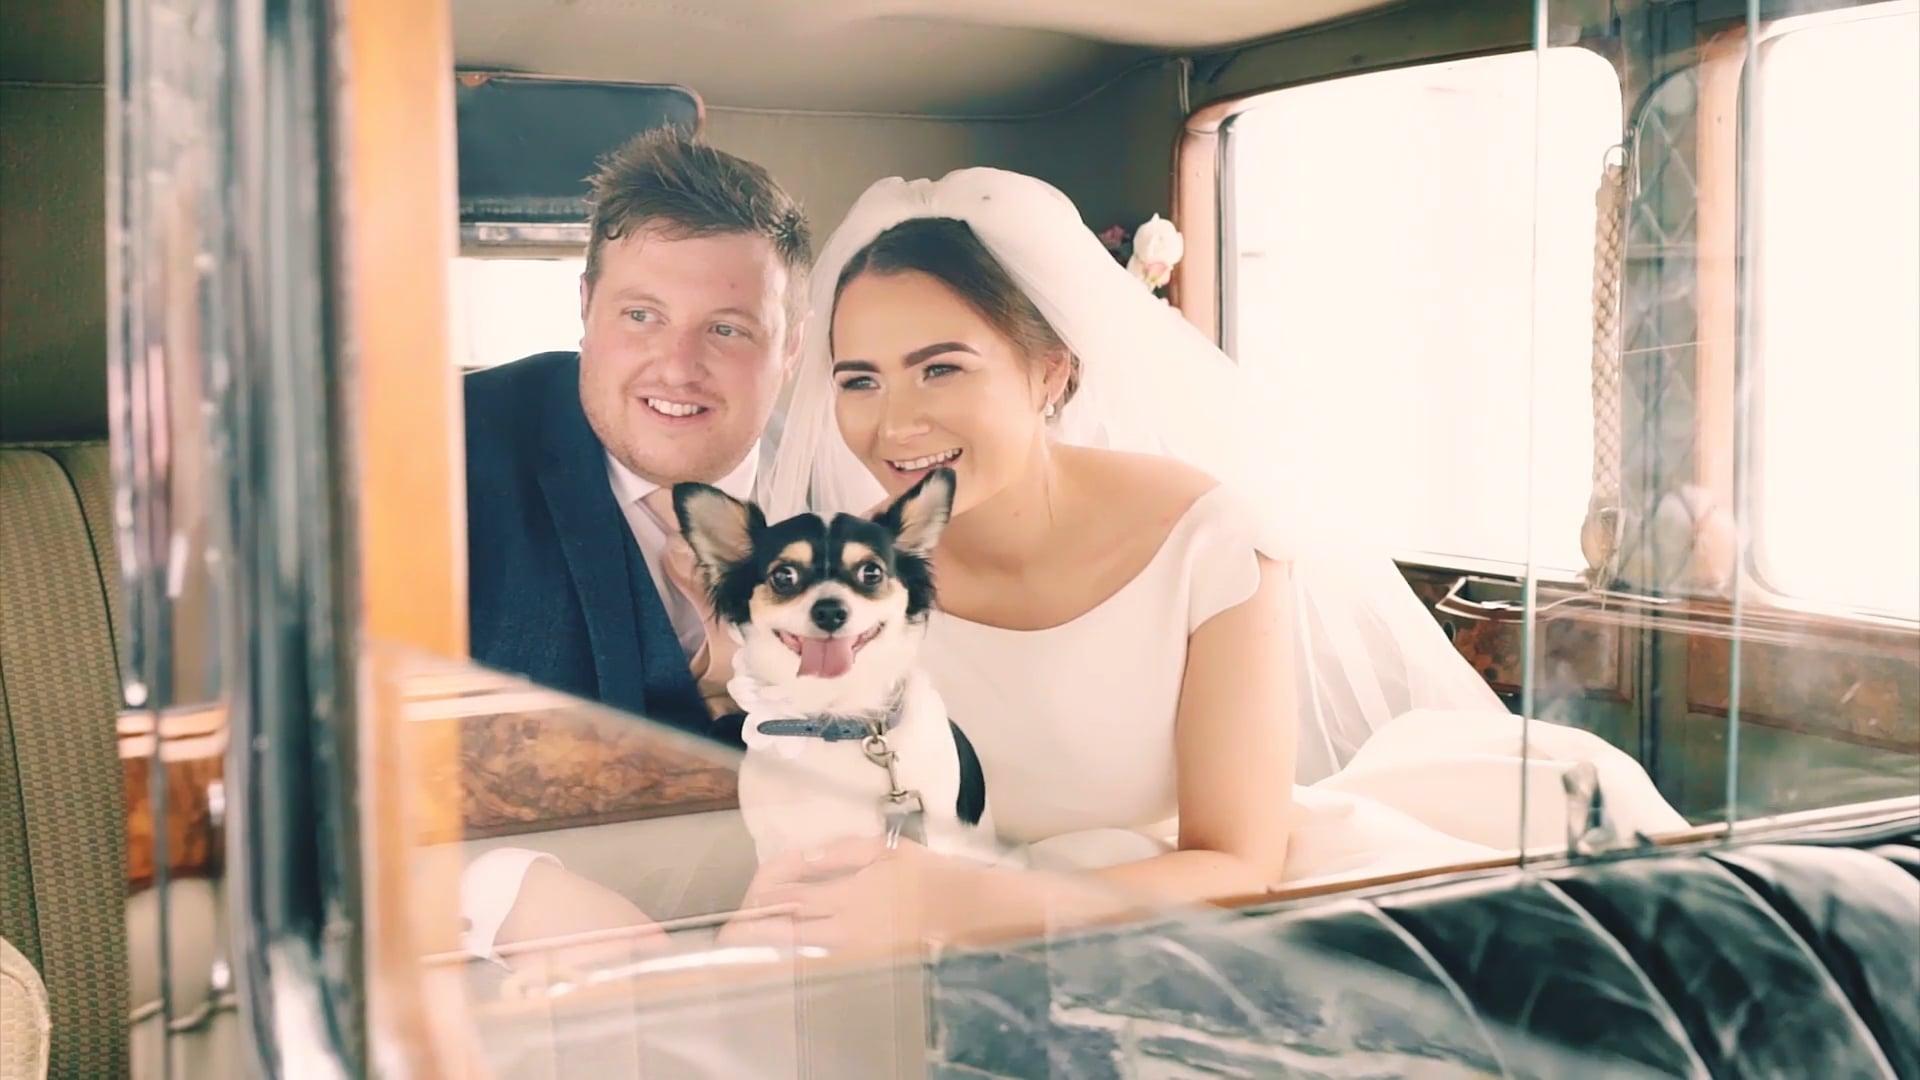 Anna & Tyron's Wedding Highlights Film - Soughton Hall | By Emily Roberts http://www.emilyjroberts.co.uk/